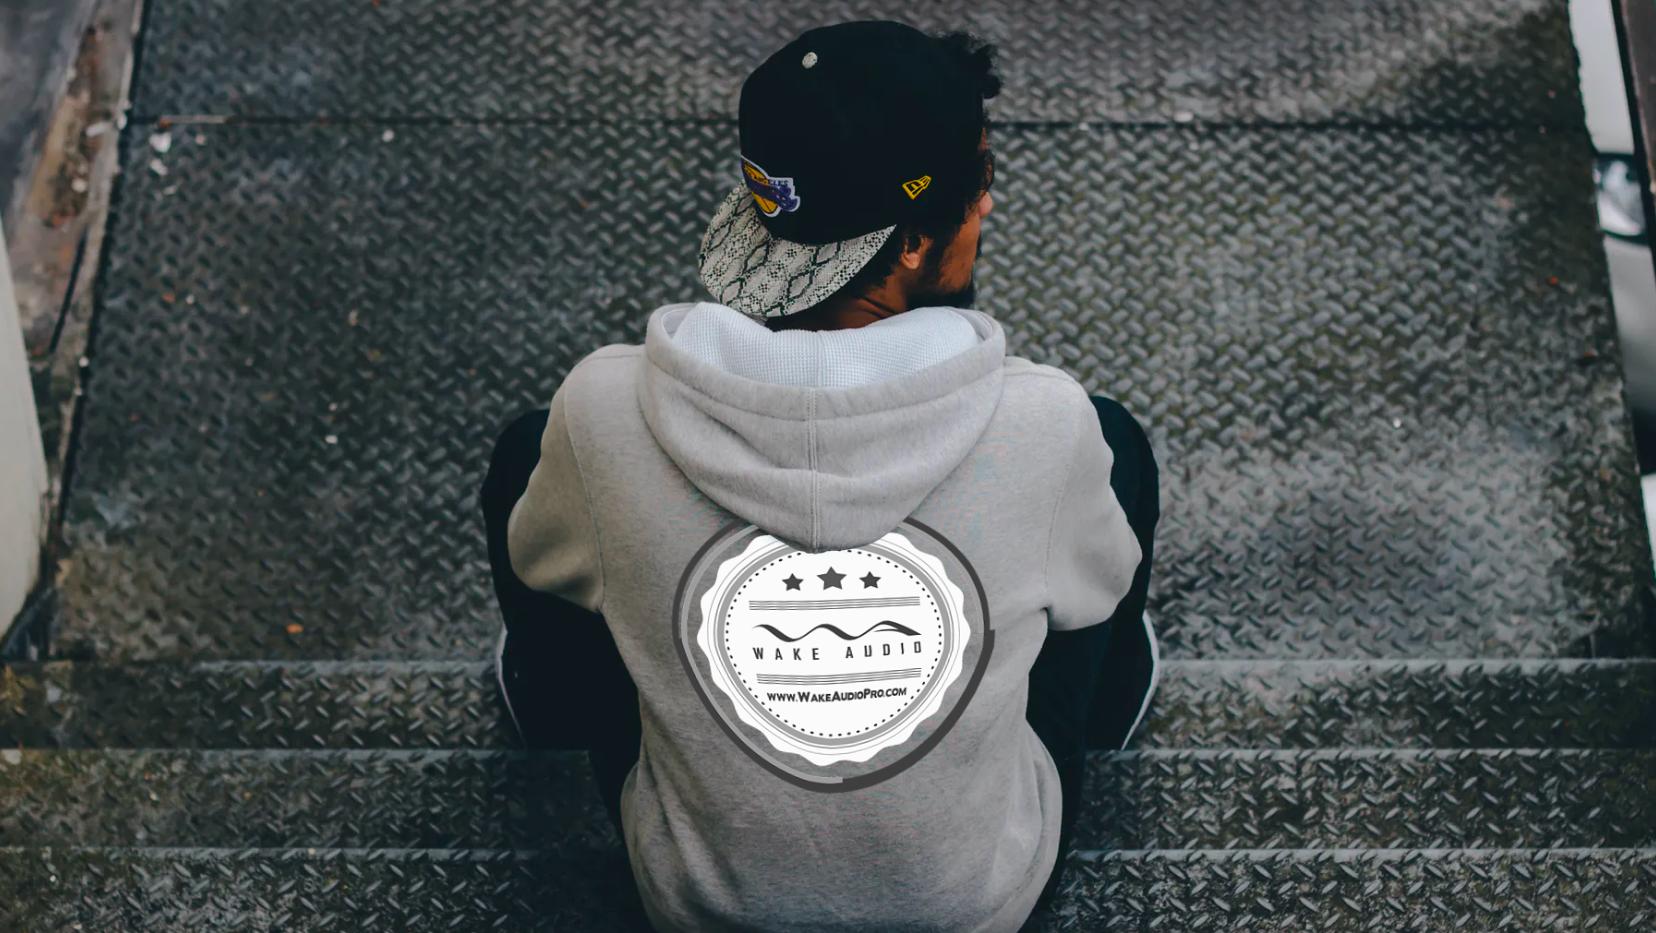 Wake Audio Grey Hoodie